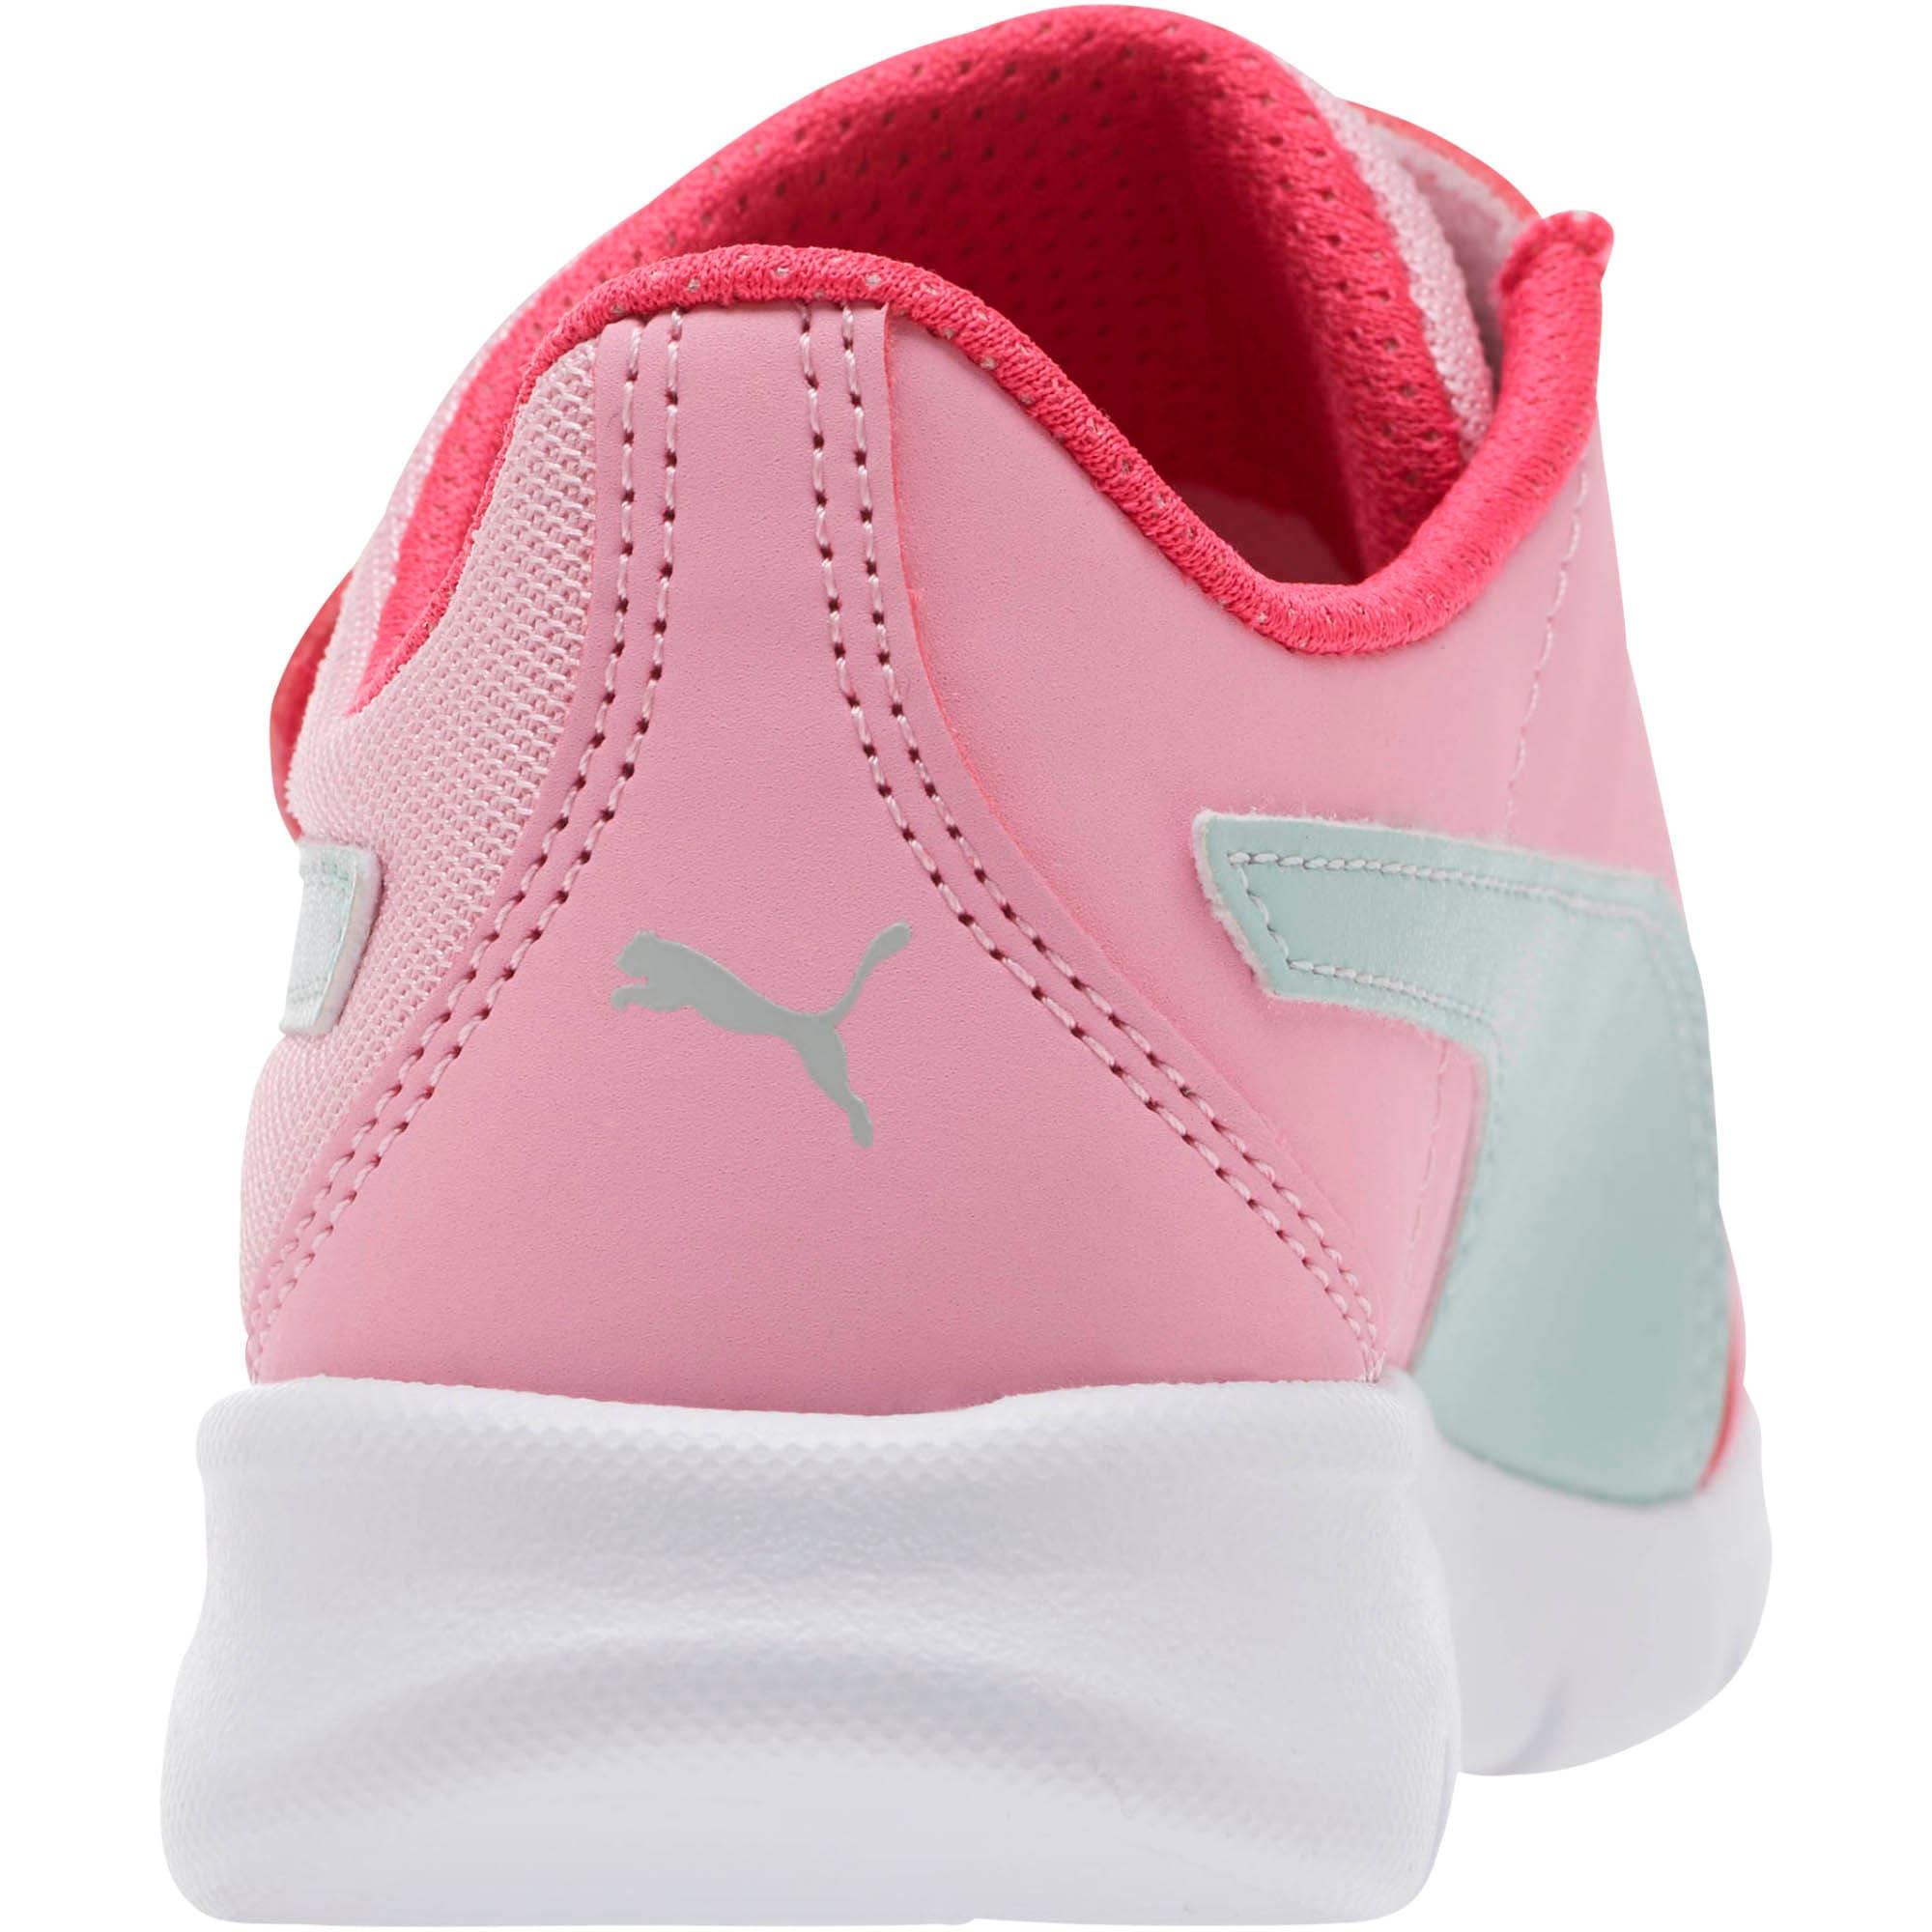 Thumbnail 4 of Bao 3 AC Little Kids' Shoes, Pale Pink-Fair Aqua-Purple, medium